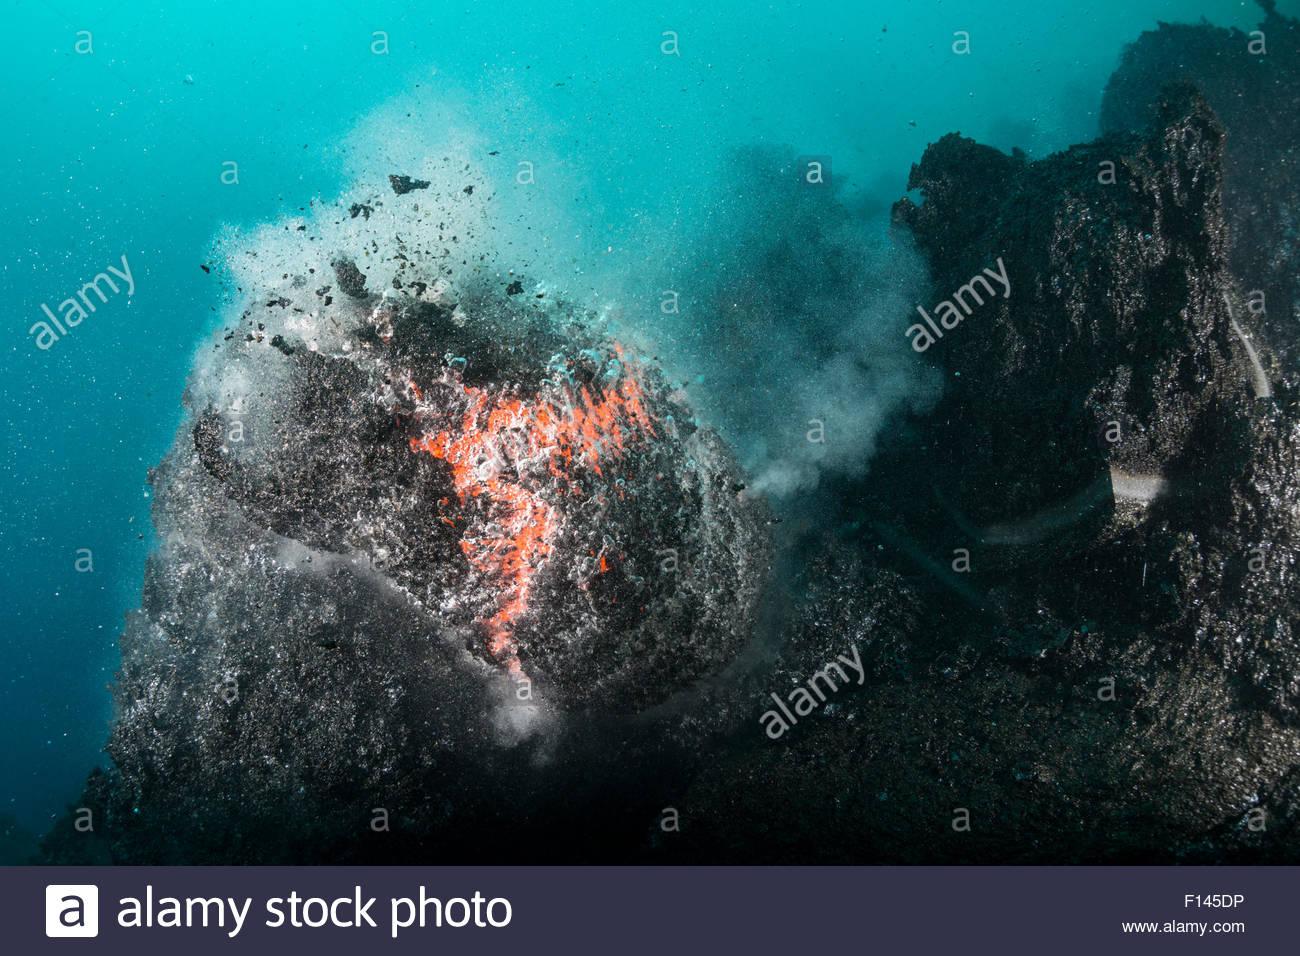 hot lava from kilauea volcano erupting underwater as